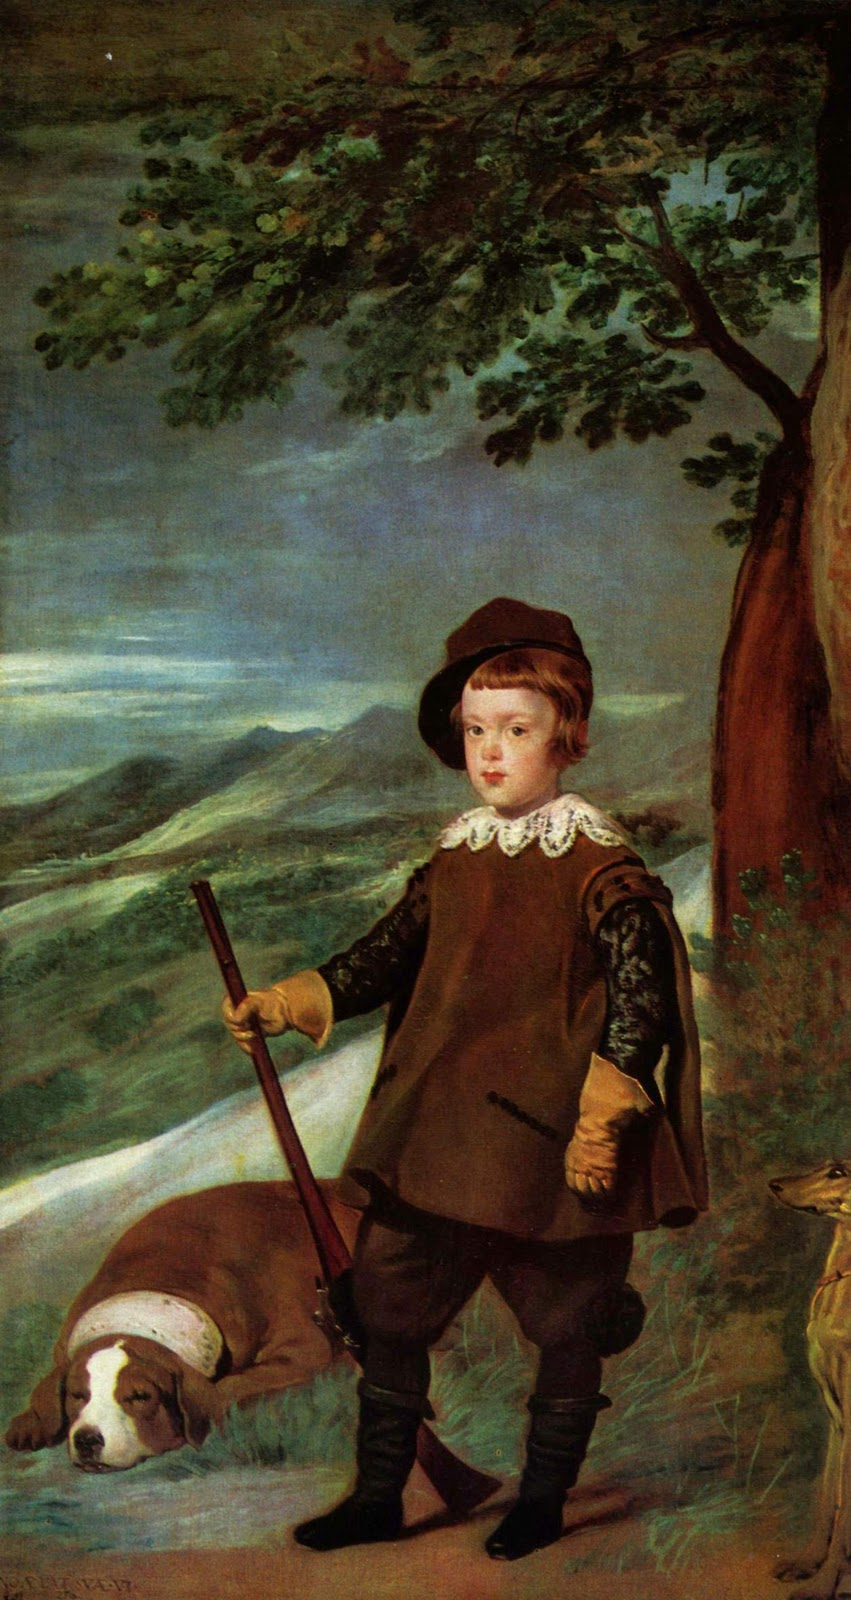 Caza real: retratos de Velázquez a propósito de esta actividad ...